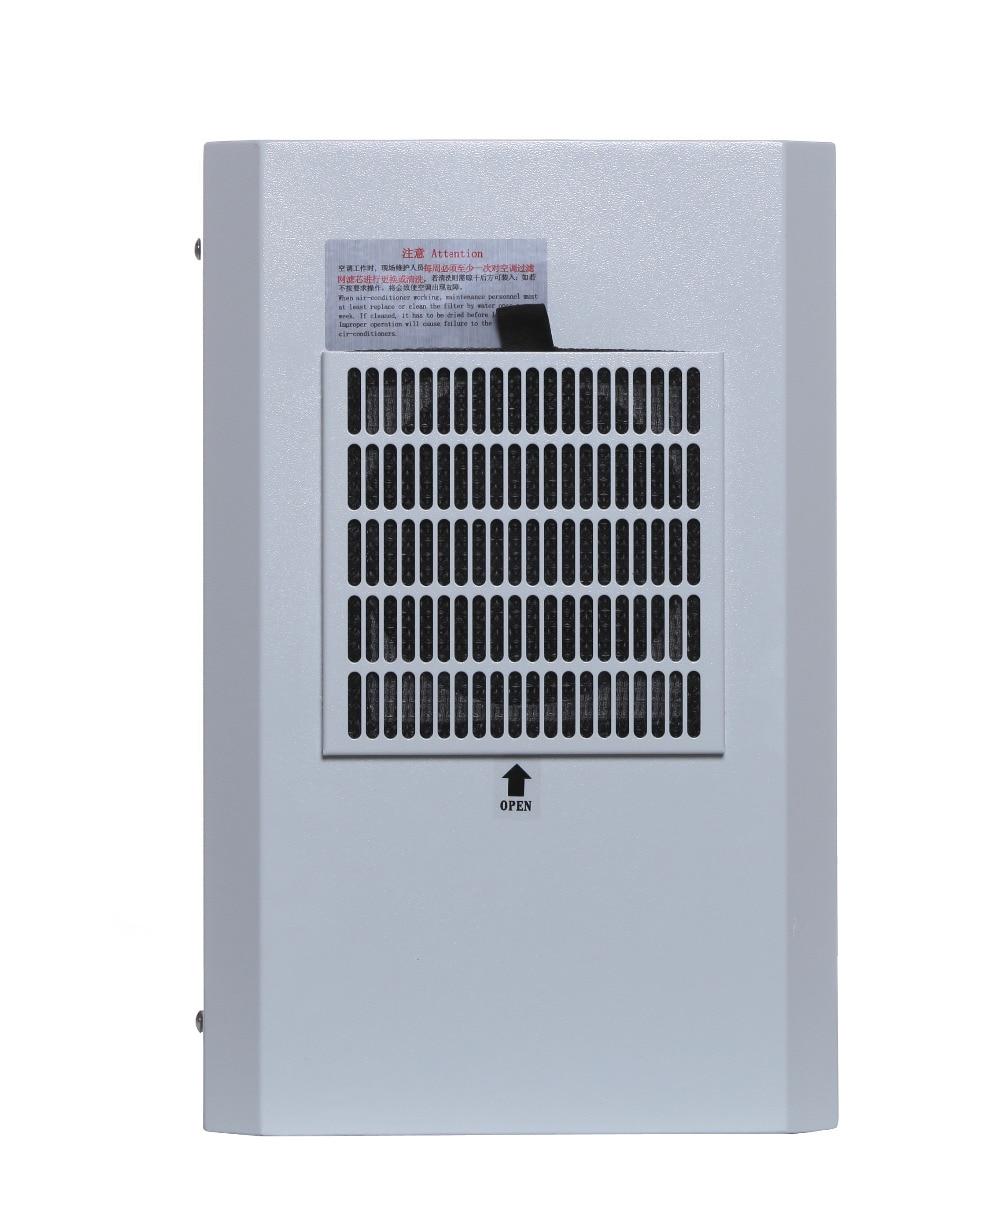 Cnc Milling Machine Cabinet Air Conditioner Heat Exchanger